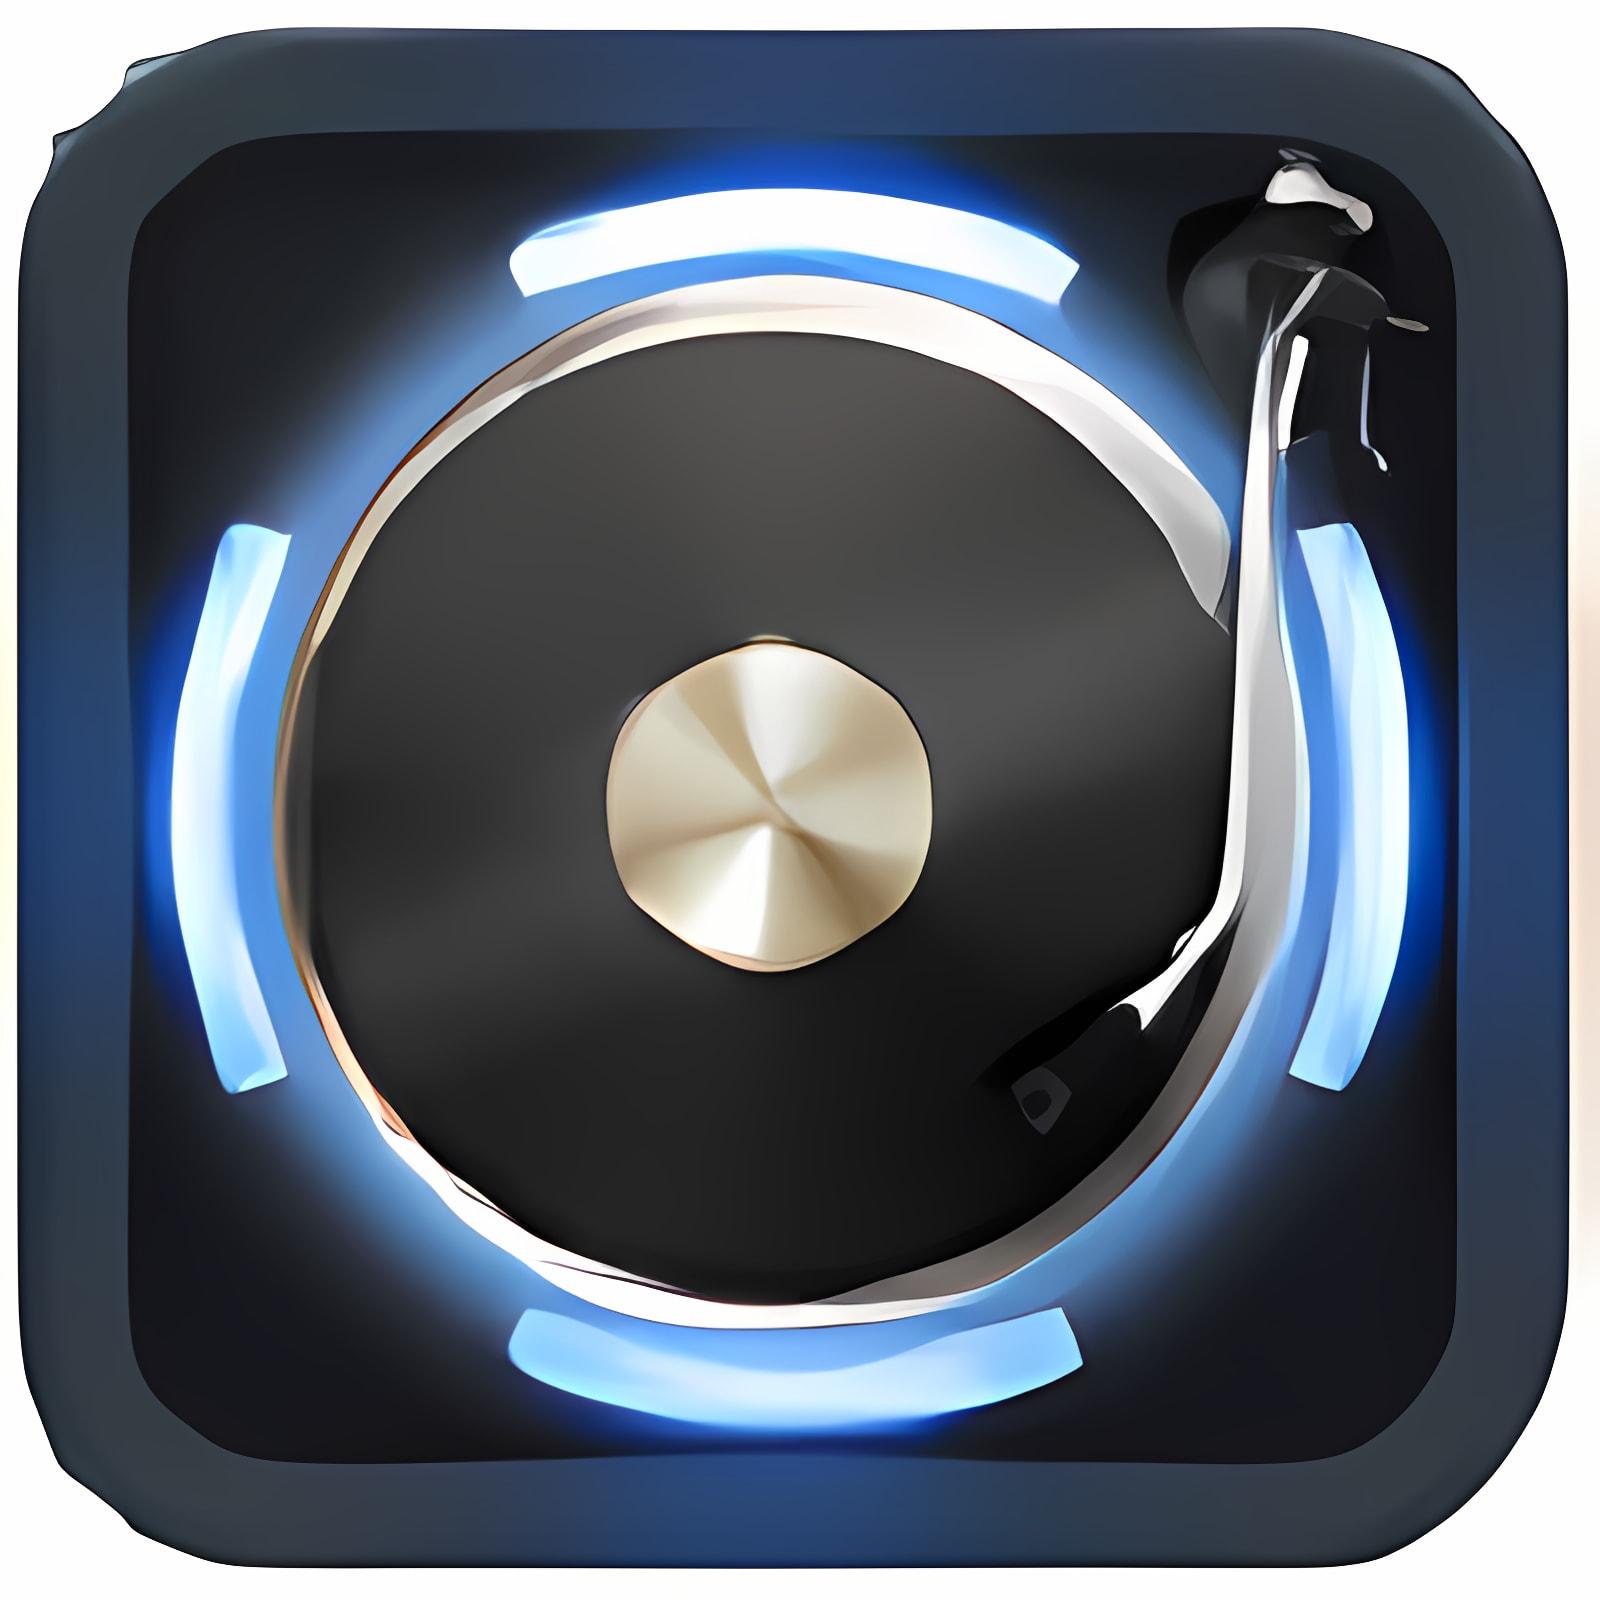 CuteDJ - Mac DJ Software